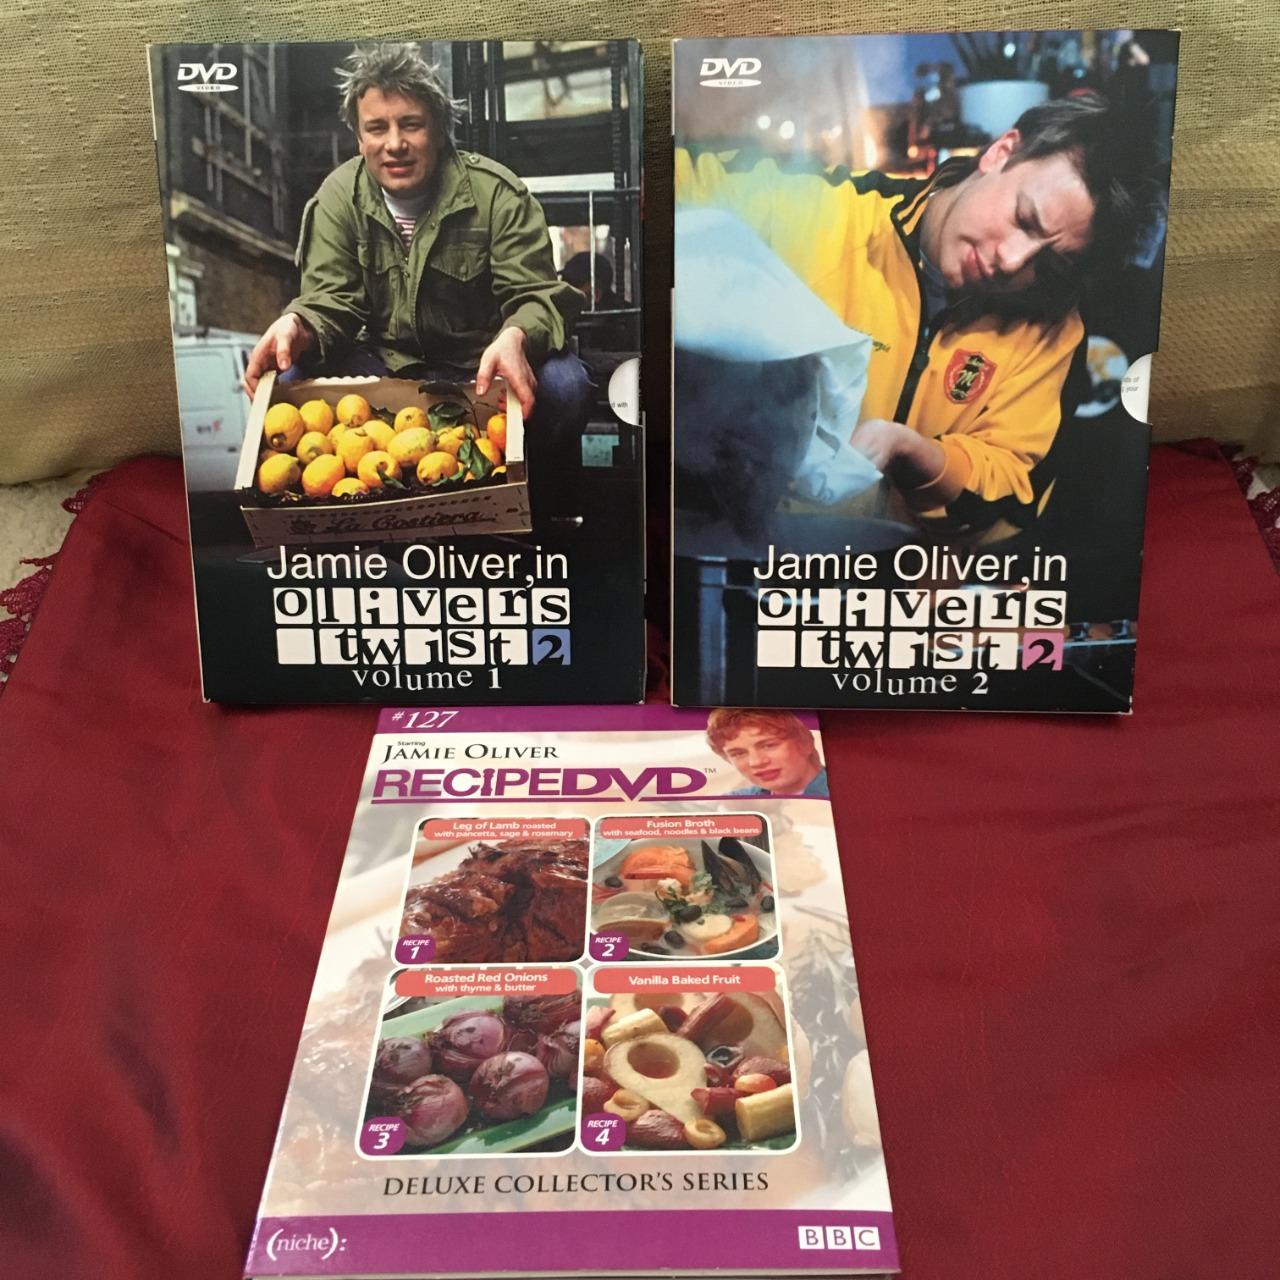 Jamie Oliver in Oliver's Twist 2 - DVD Disc Set (Vol 1 & 2) + Recipe DVD Disc, Region Code : 4